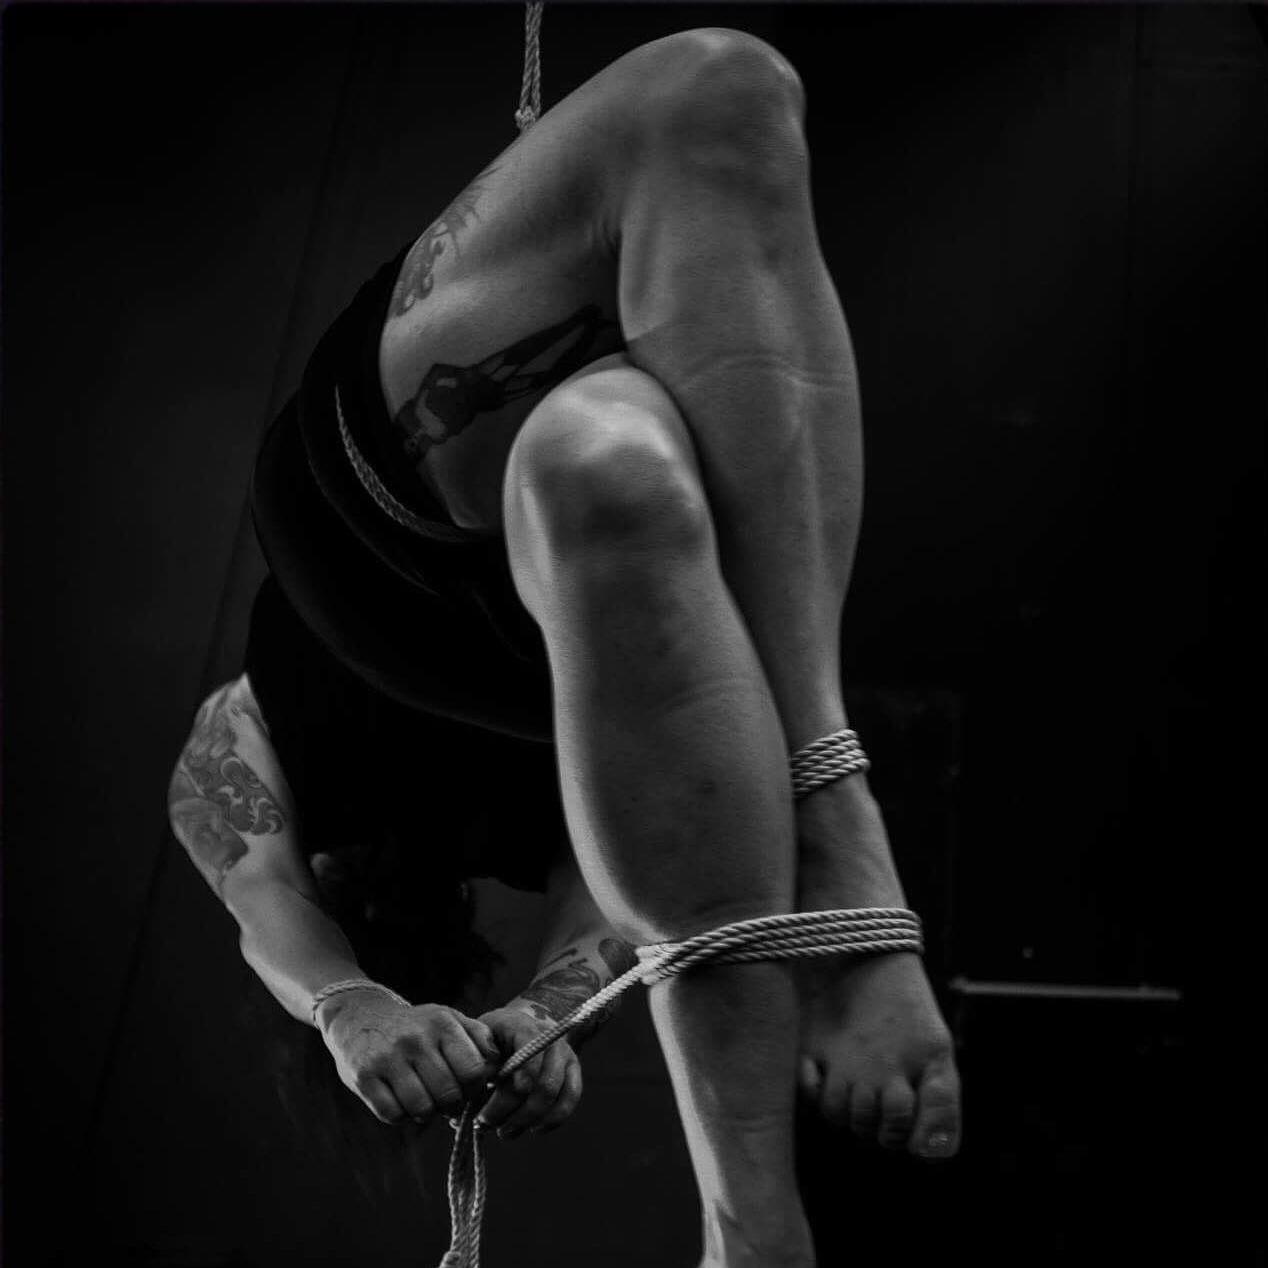 Dekadamen - Stockholm, SwedenModelling // Performance // Artistic WorkPhotographyemail // fetlife // darkside // insta // facebookropework: KawayamaTenphoto: Cato Leinmodelling: Dekadamen